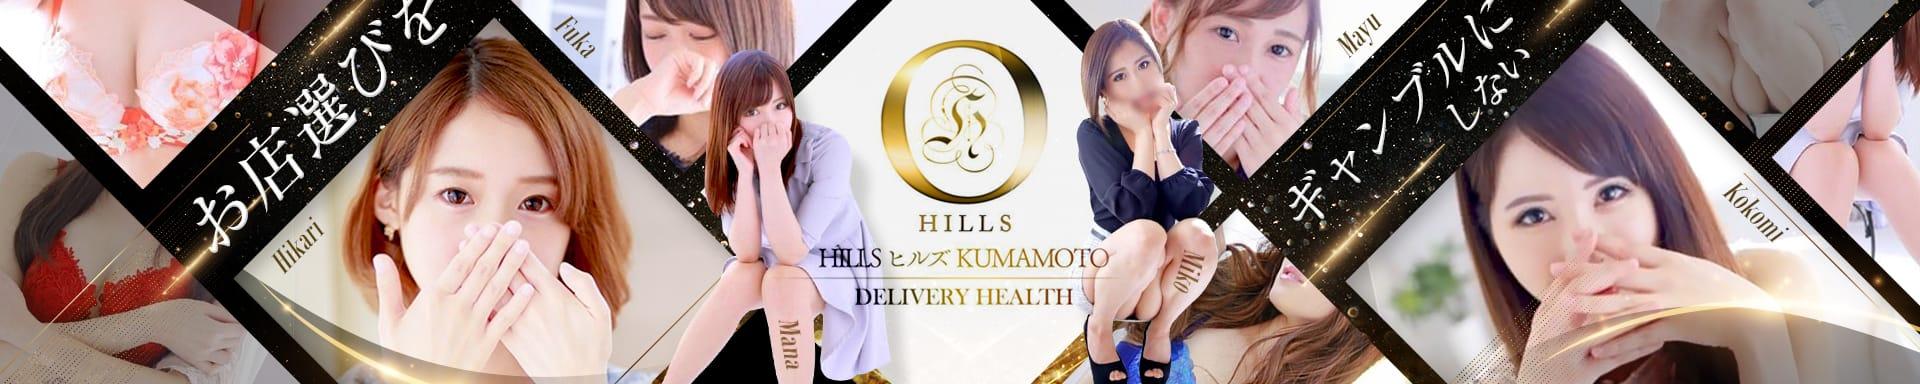 Hills Kumamoto ヒルズ熊本 その2